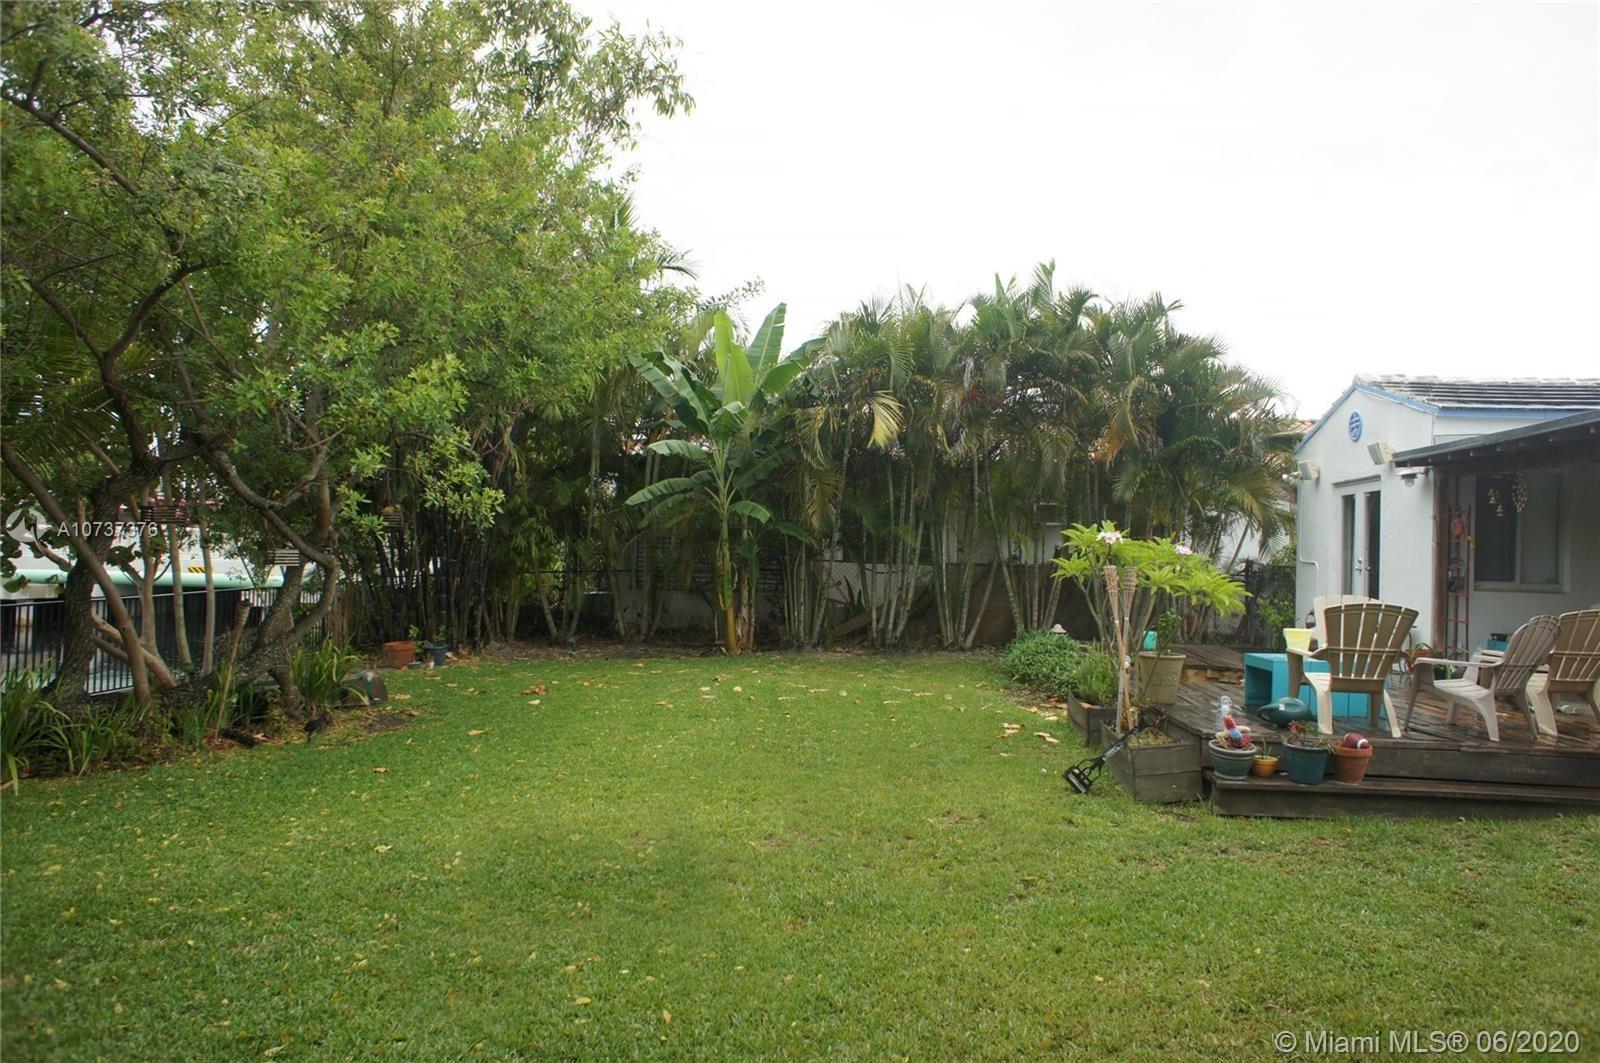 Photo 25 of Listing MLS a10737376 in 200 NE 85th St El Portal FL 33138